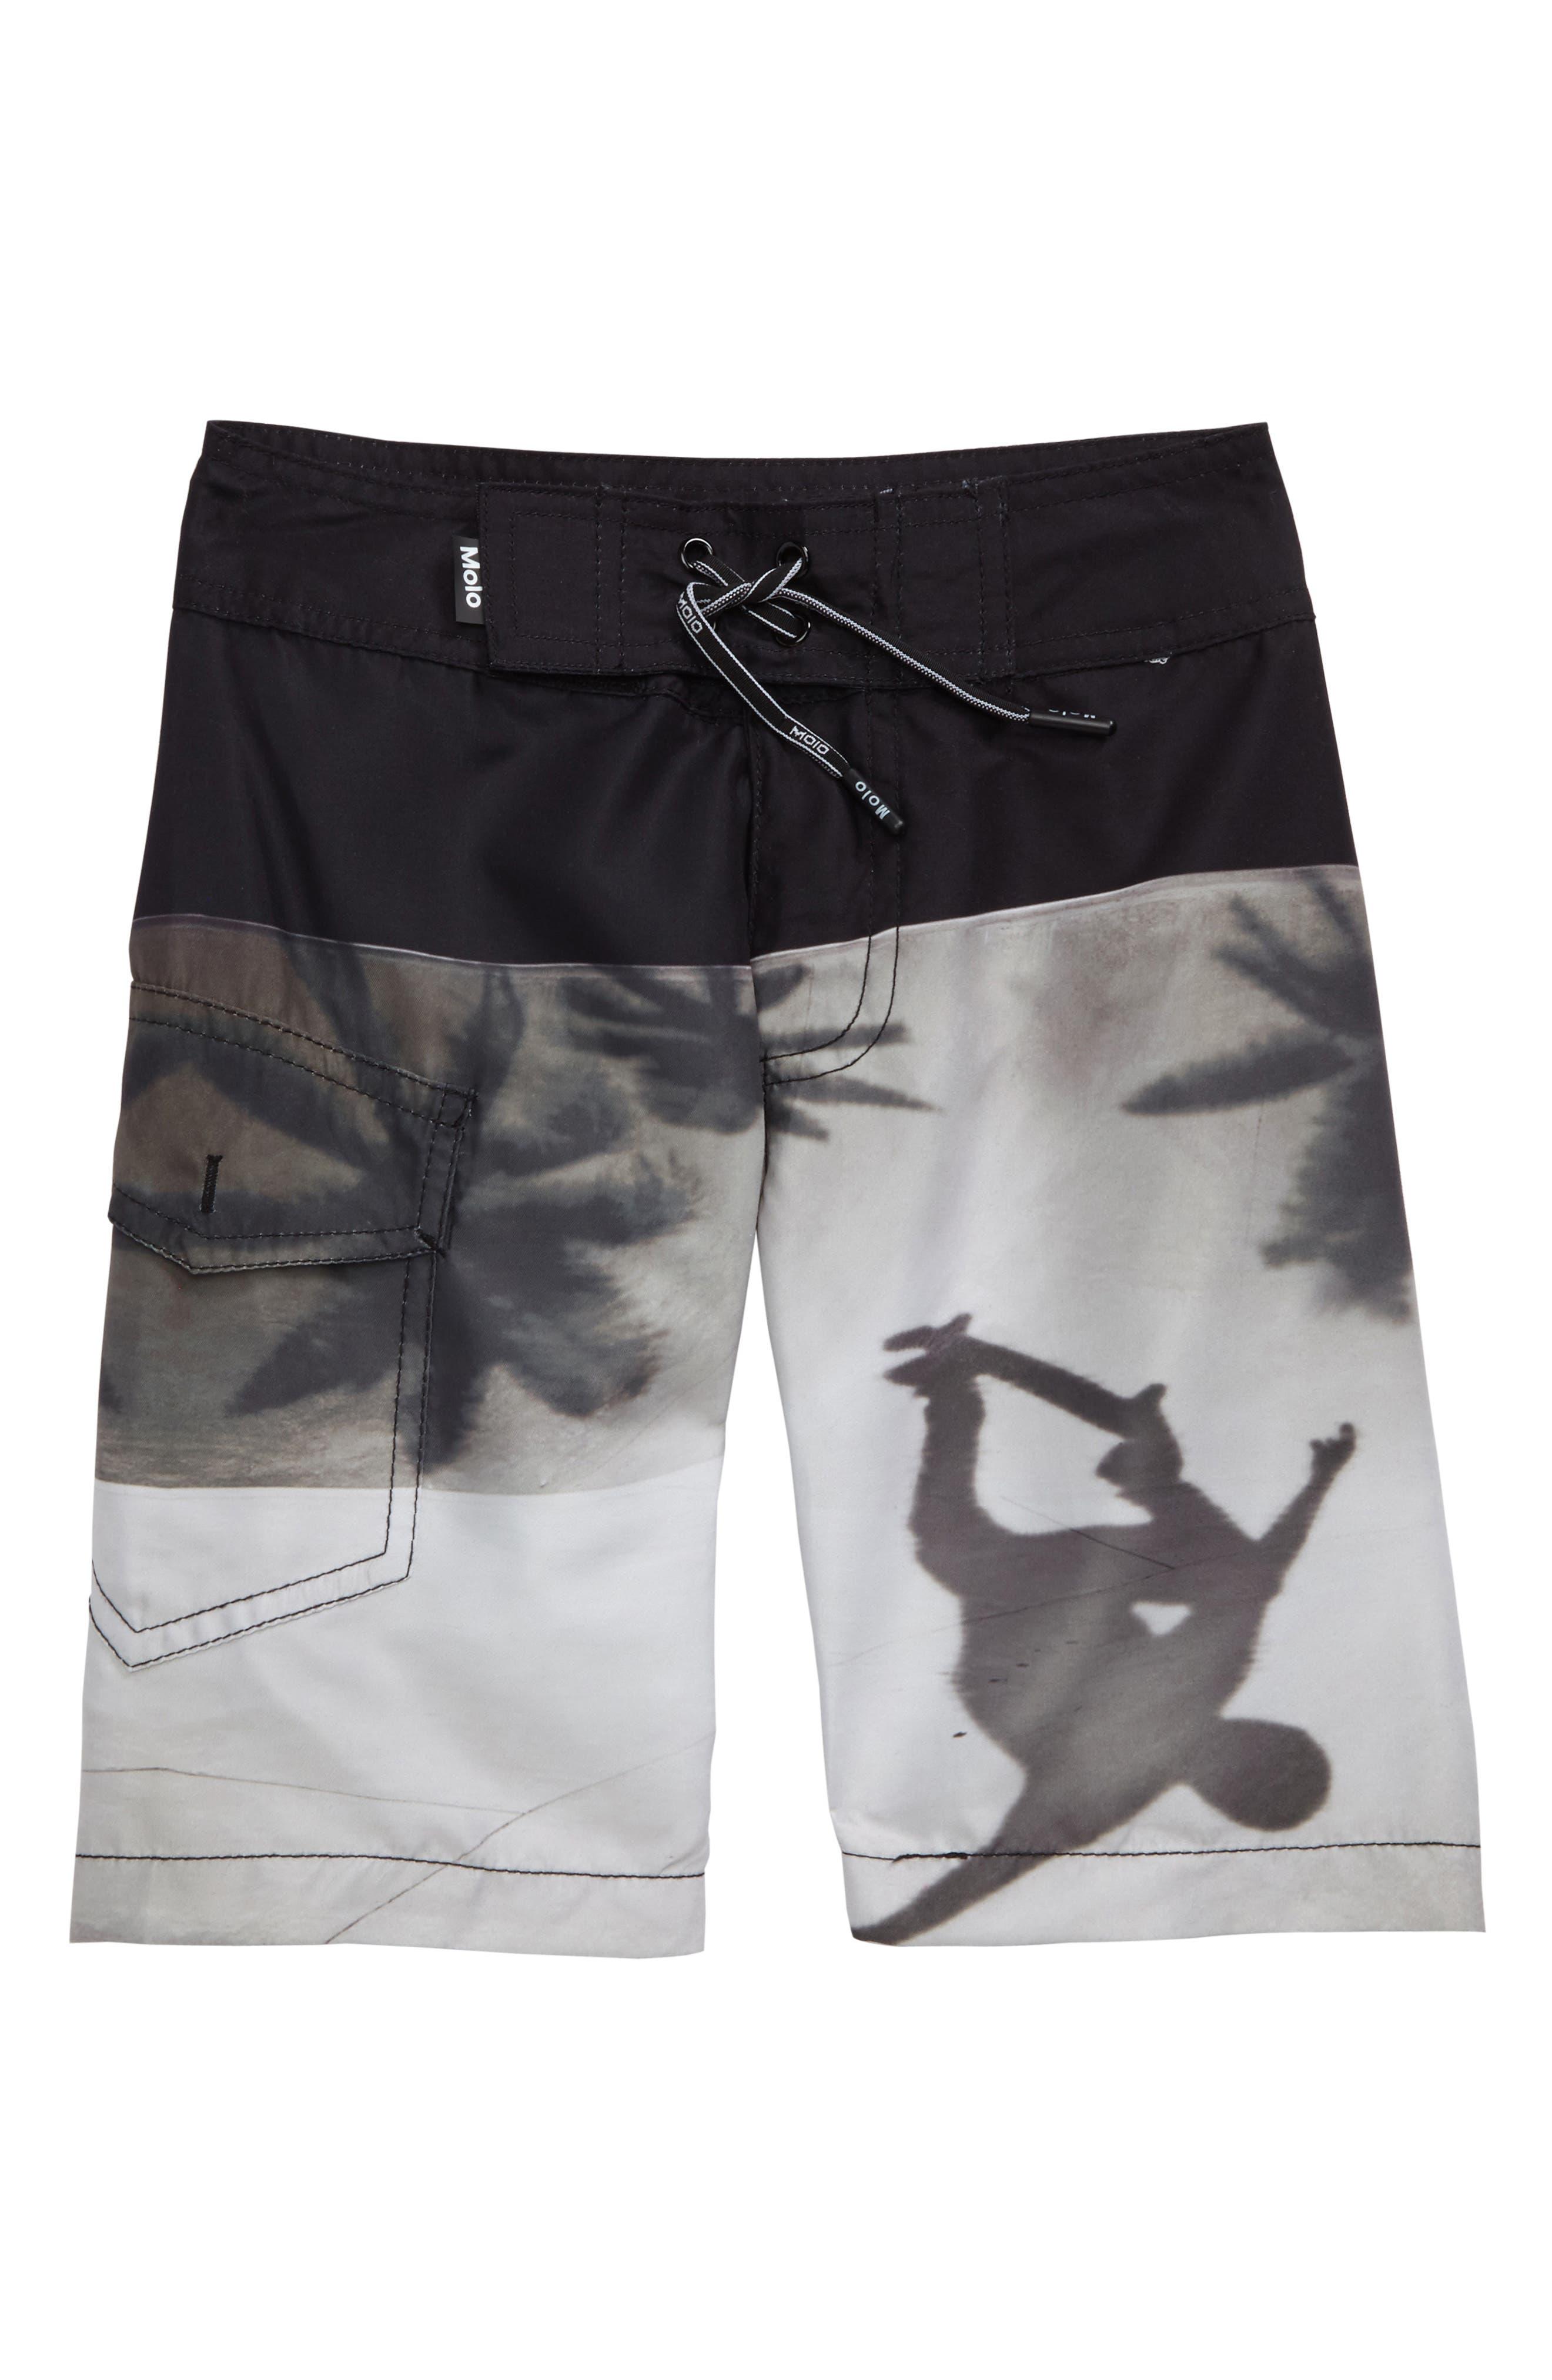 Nalvaro Board Shorts,                         Main,                         color, 001